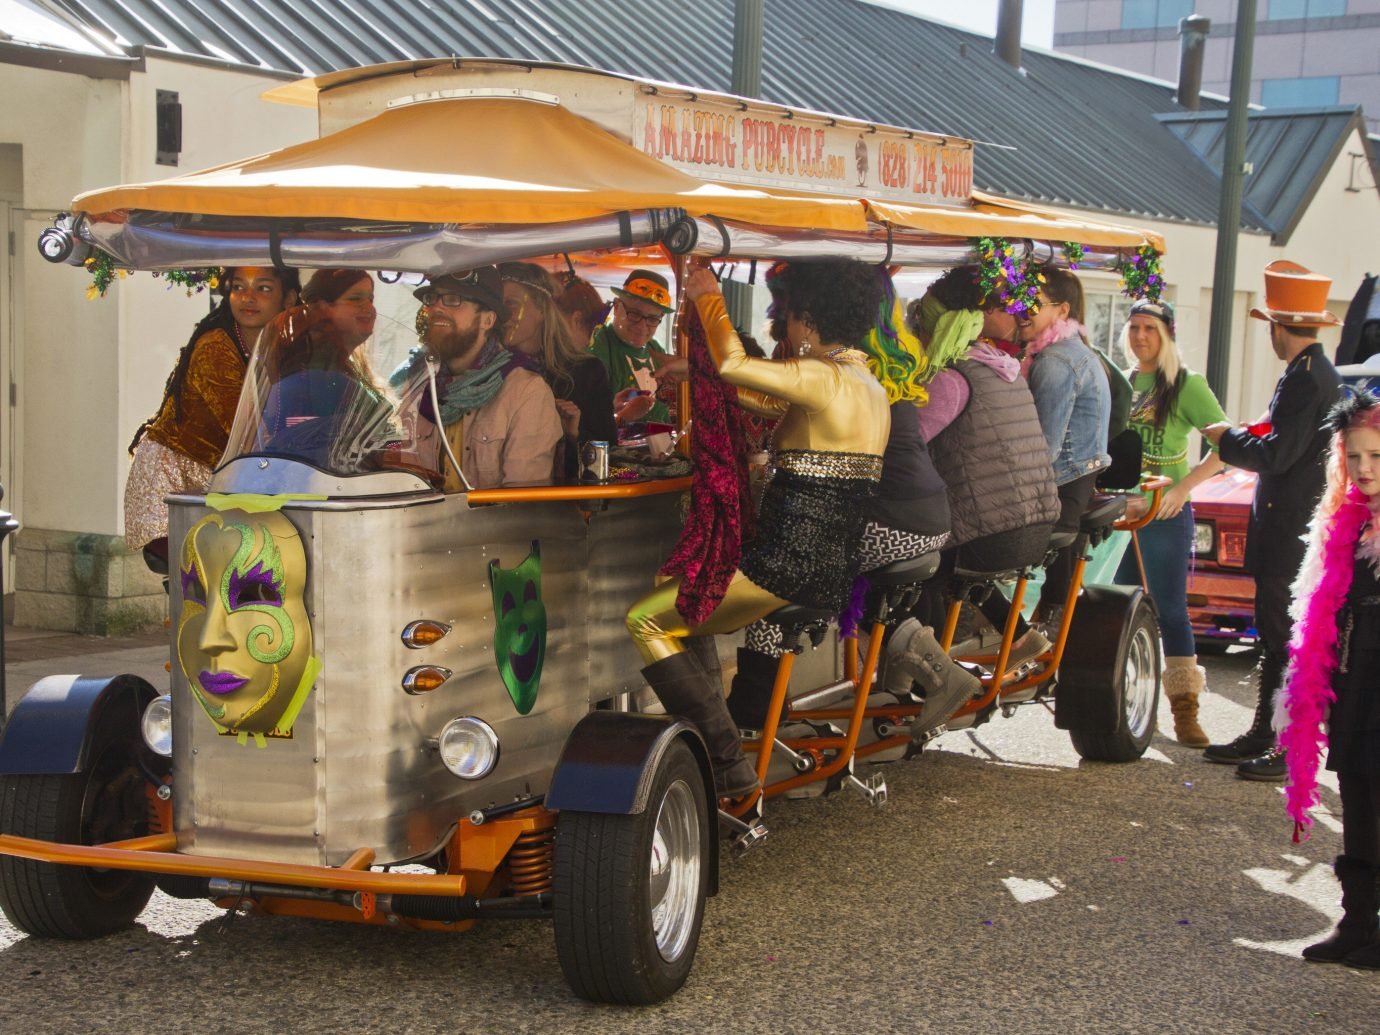 Trip Ideas outdoor transport vehicle vendor fair festival stall golfcart